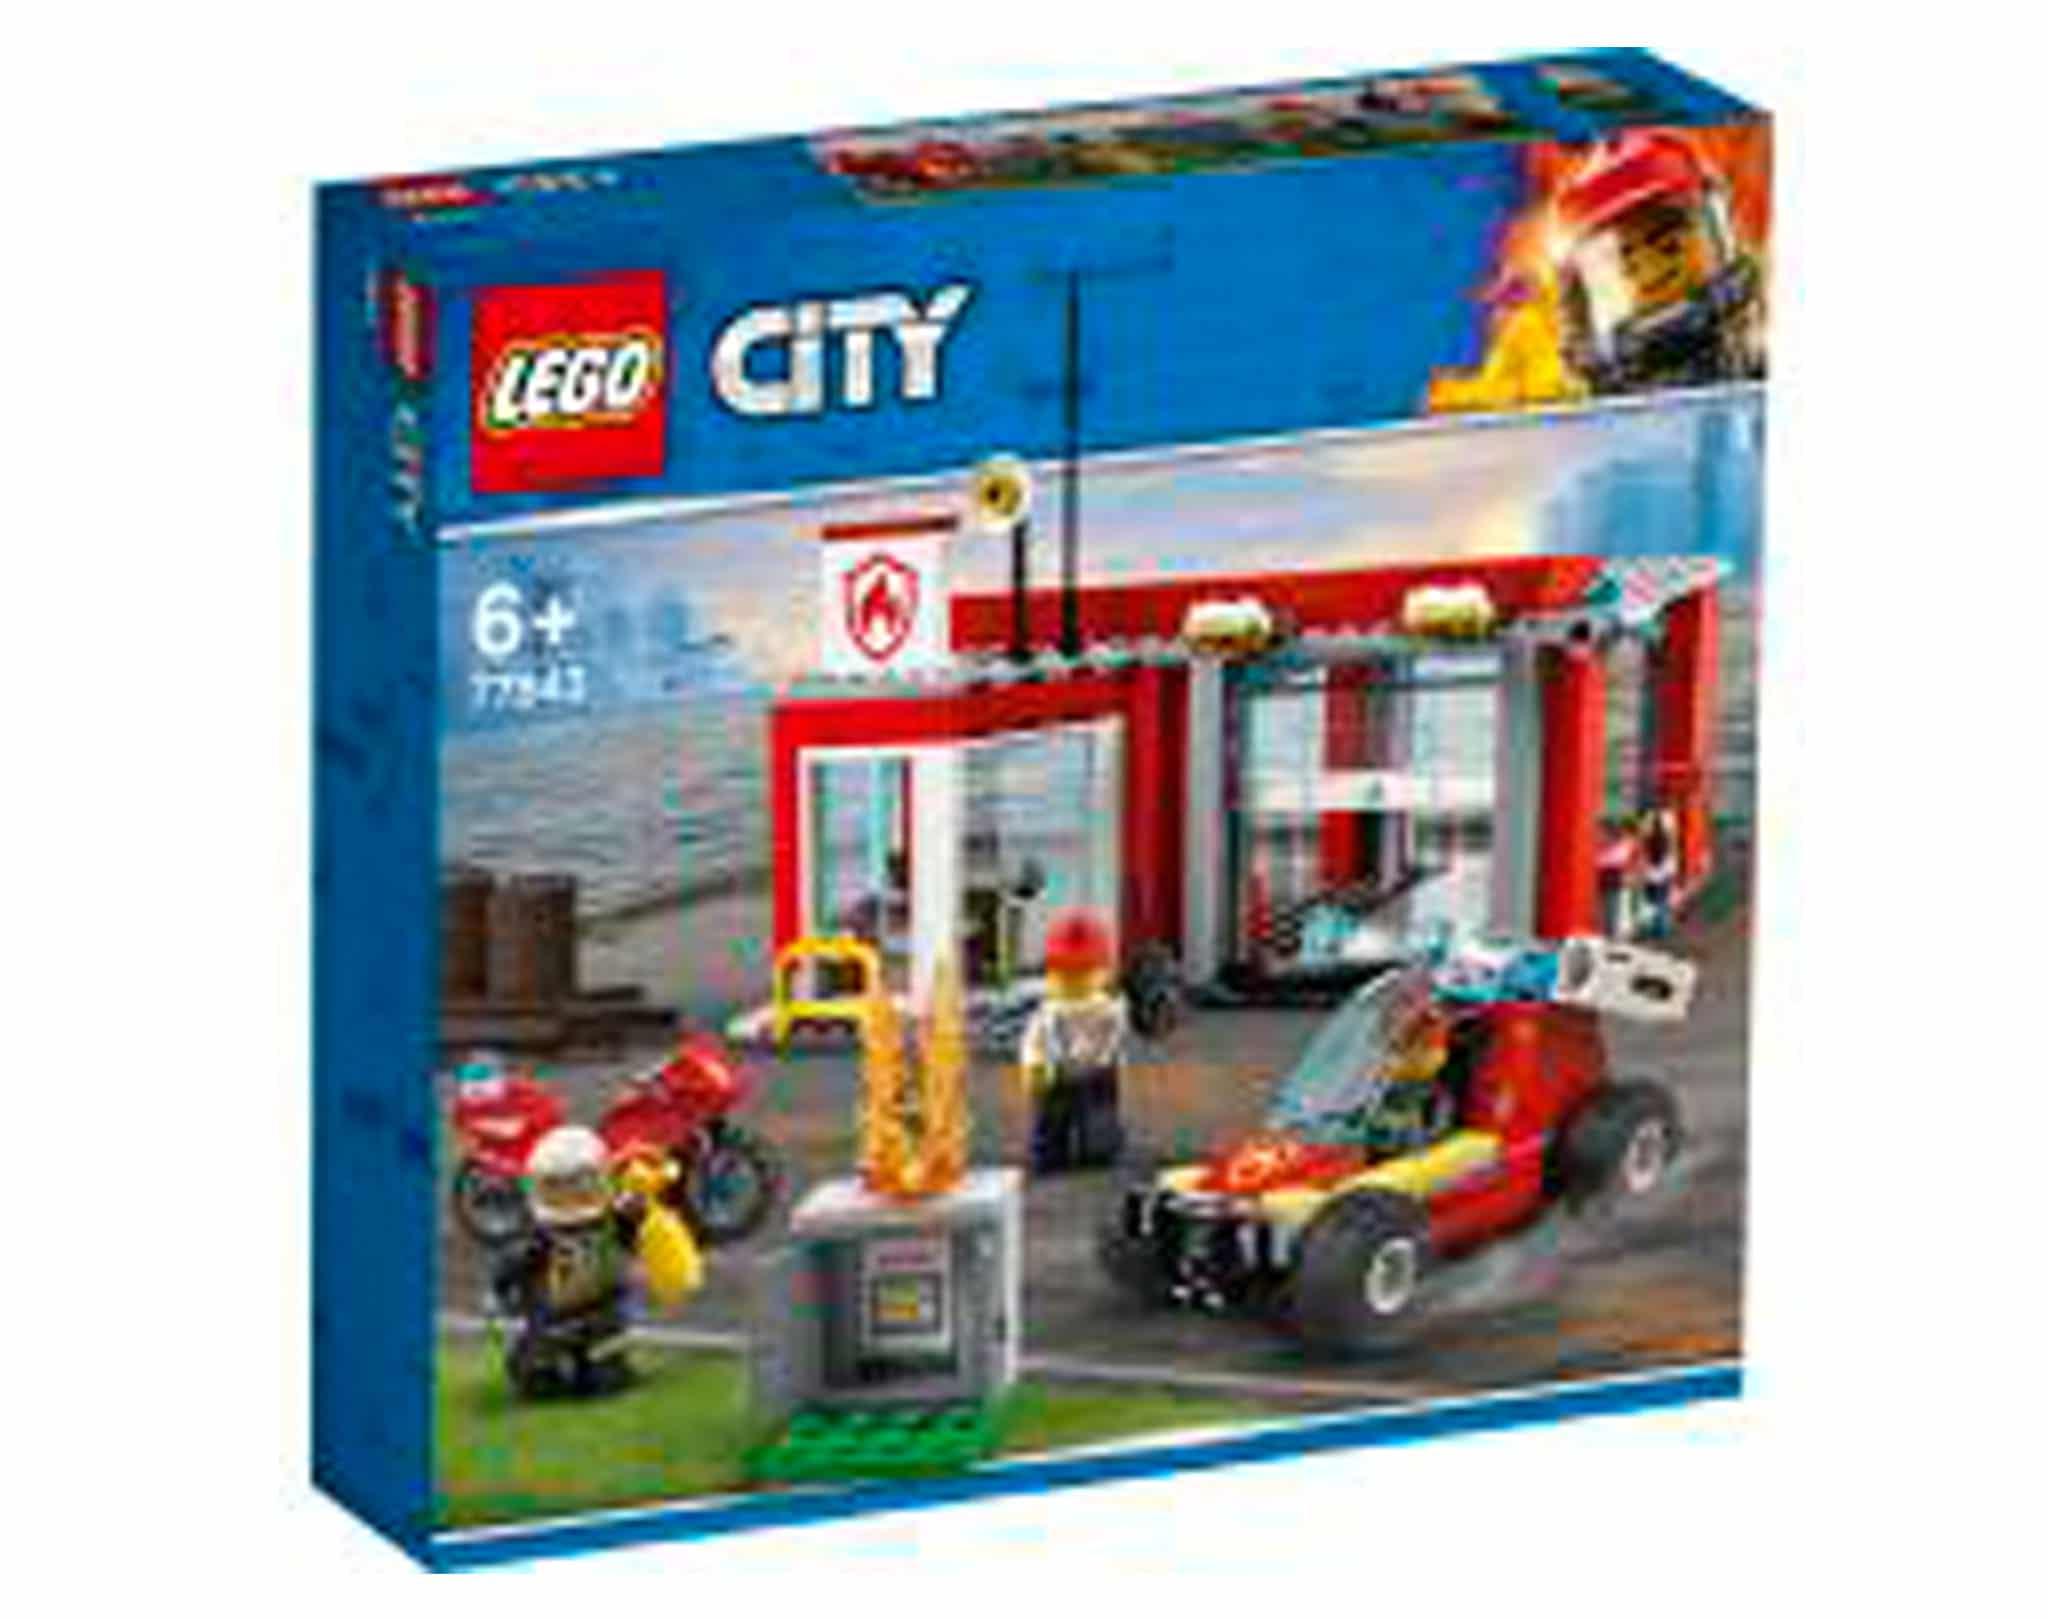 LEGO City 77943 Feuerwache Starterset